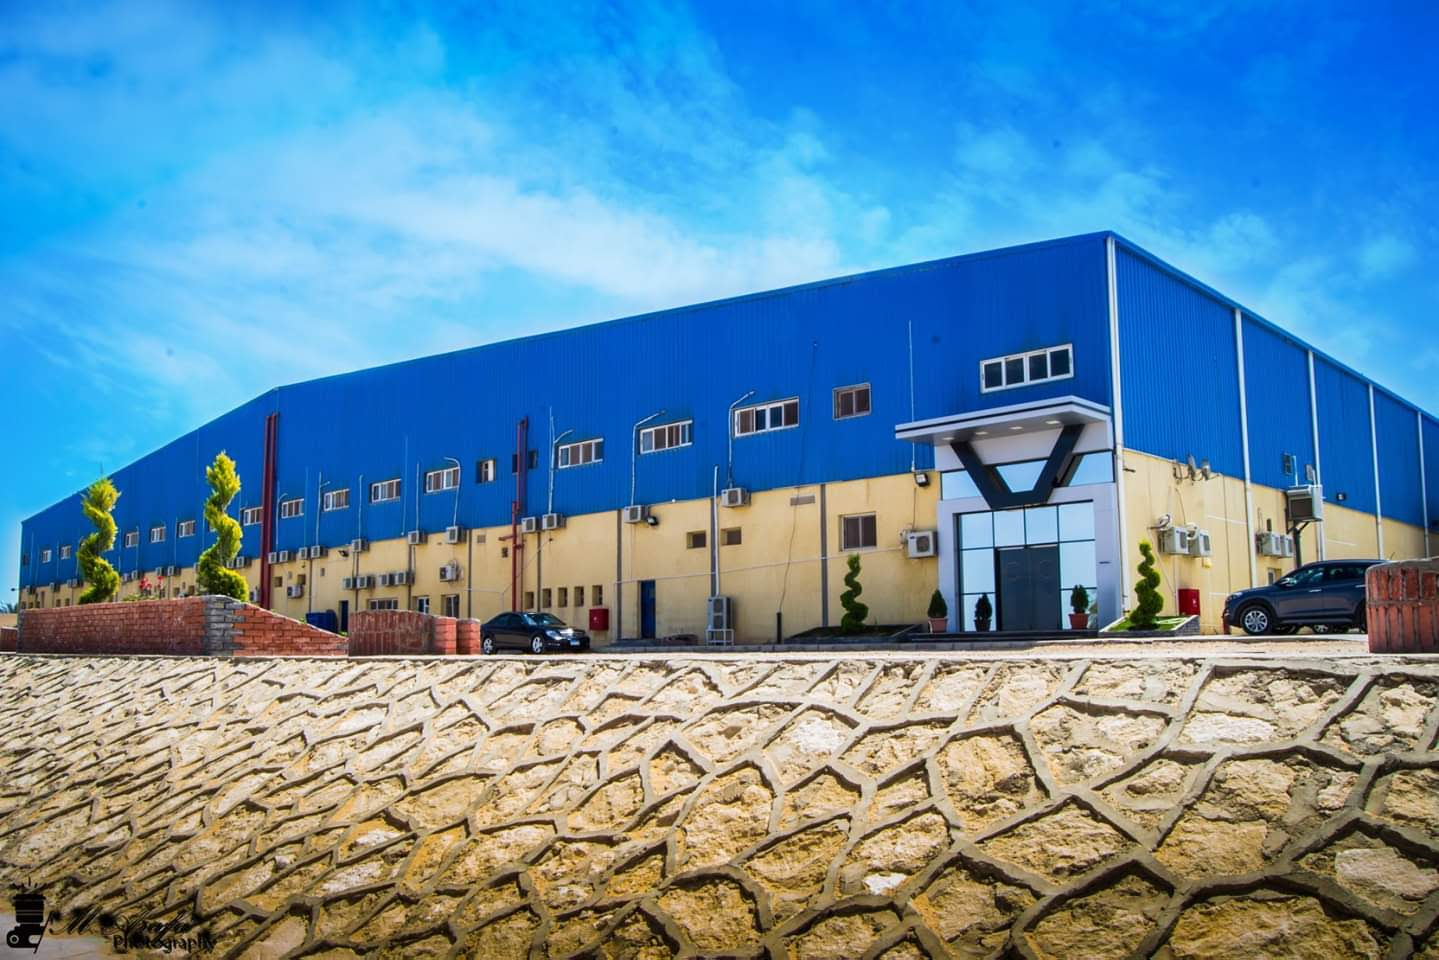 مصنع مكه للعصائر